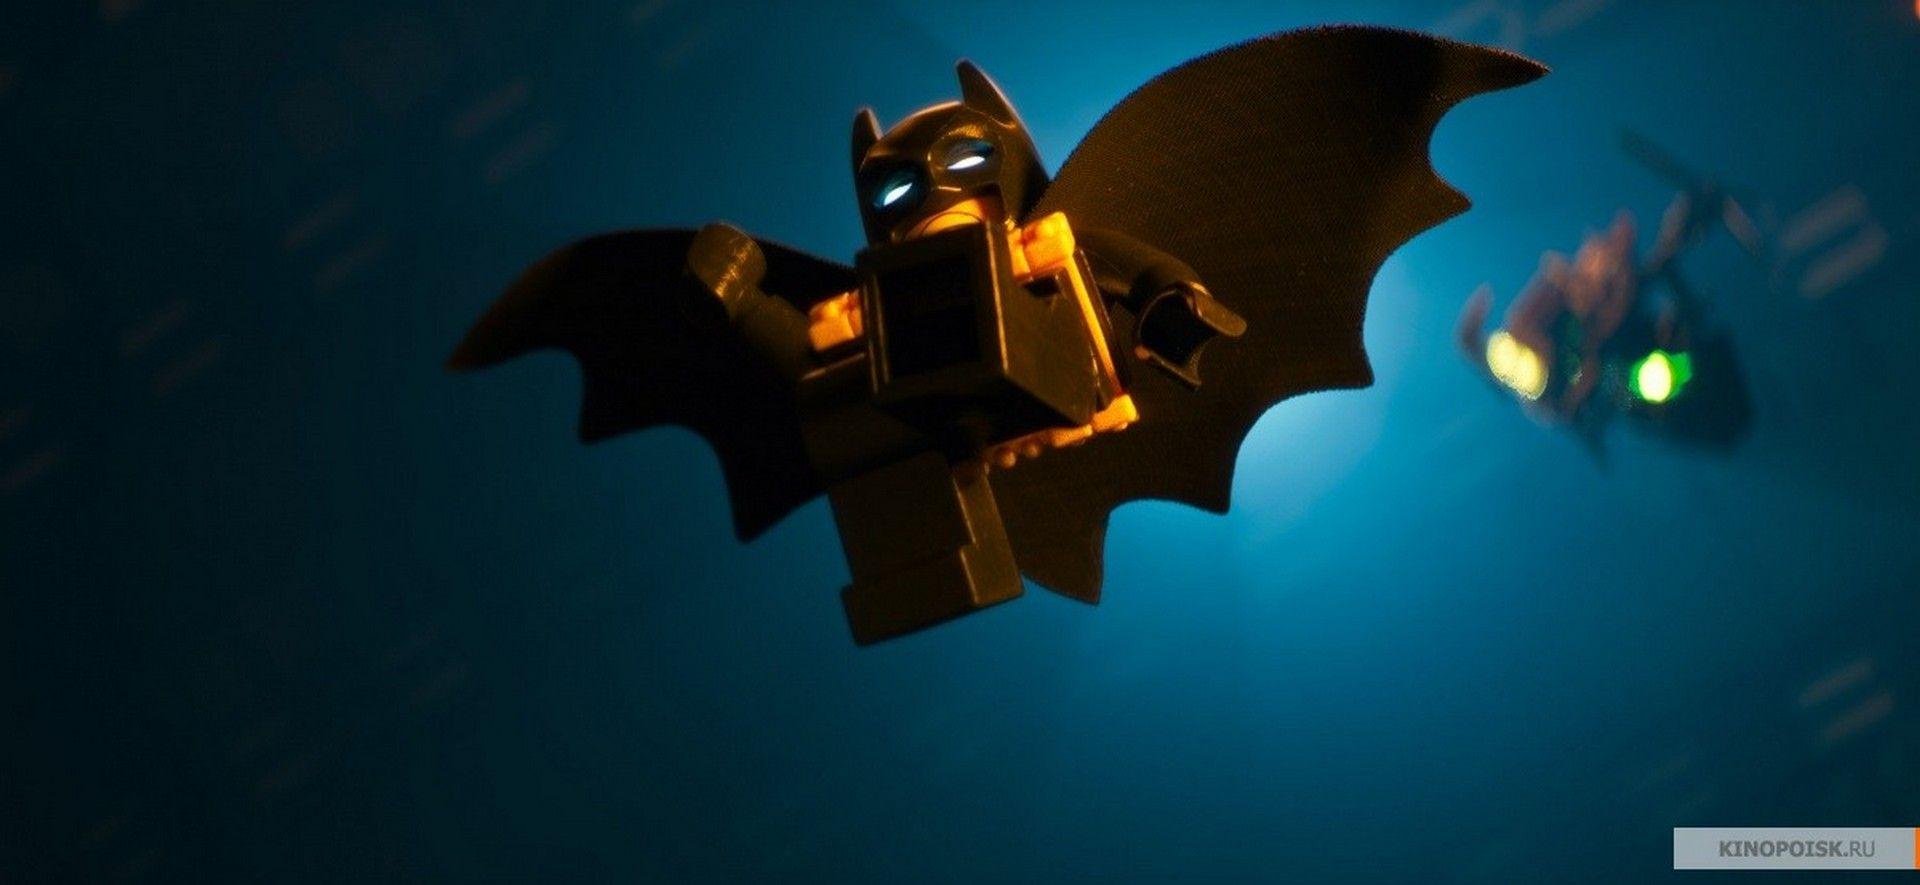 Hd The Lego Batman Movie Wallpaper Lego Batman Lego Batman Movie Batman Movie